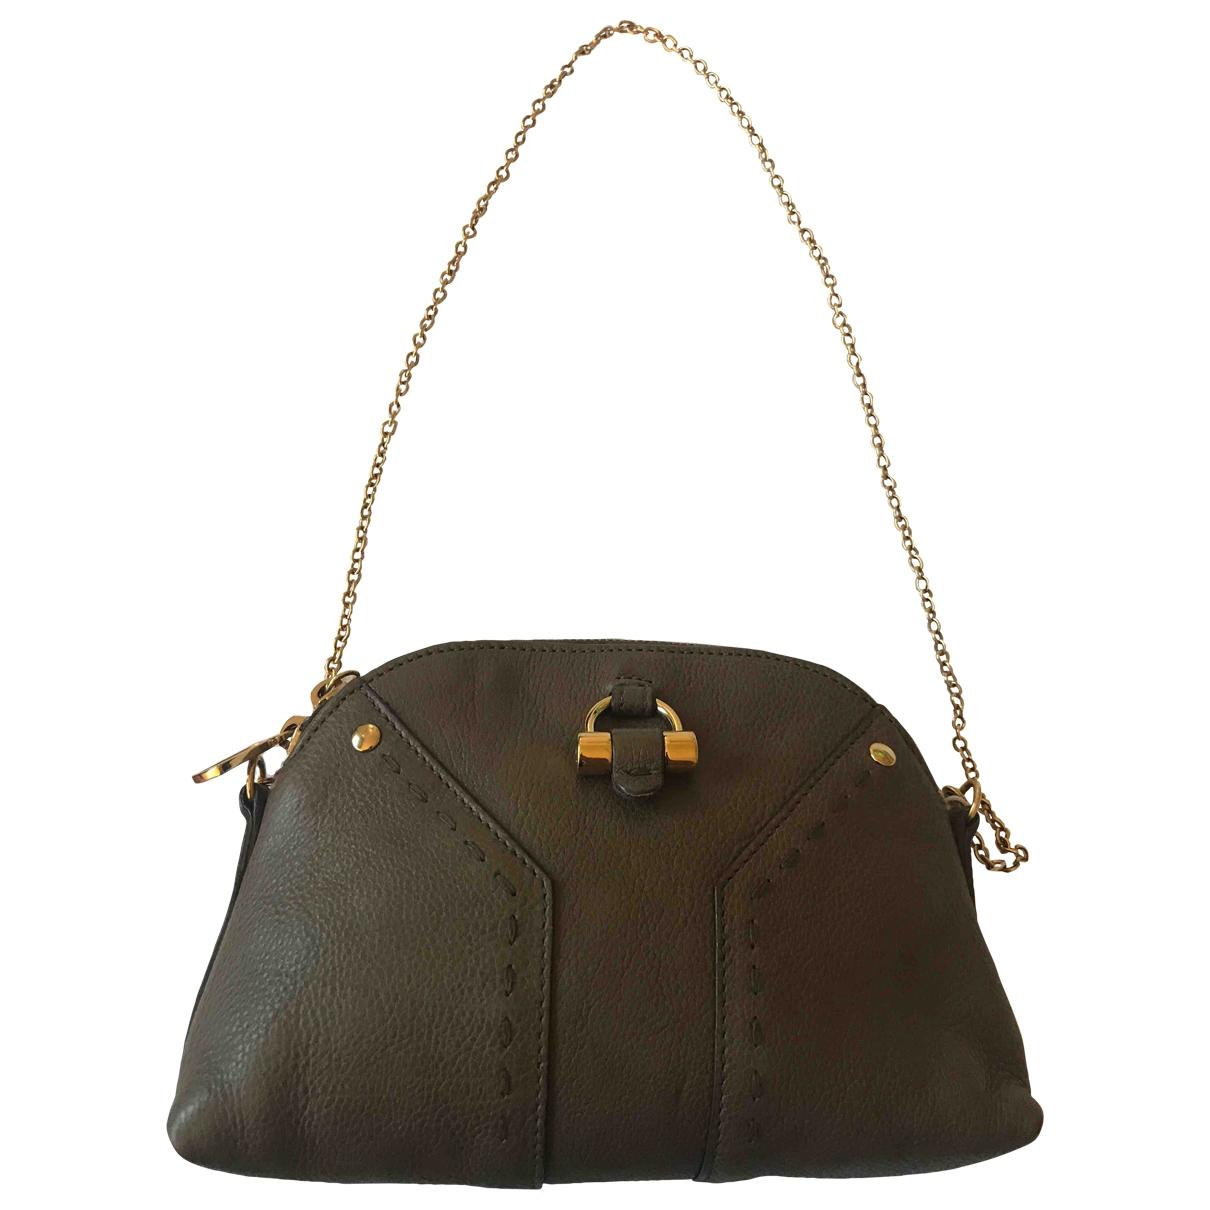 Yves Saint Laurent Muse Handtasche in  Beige Leder